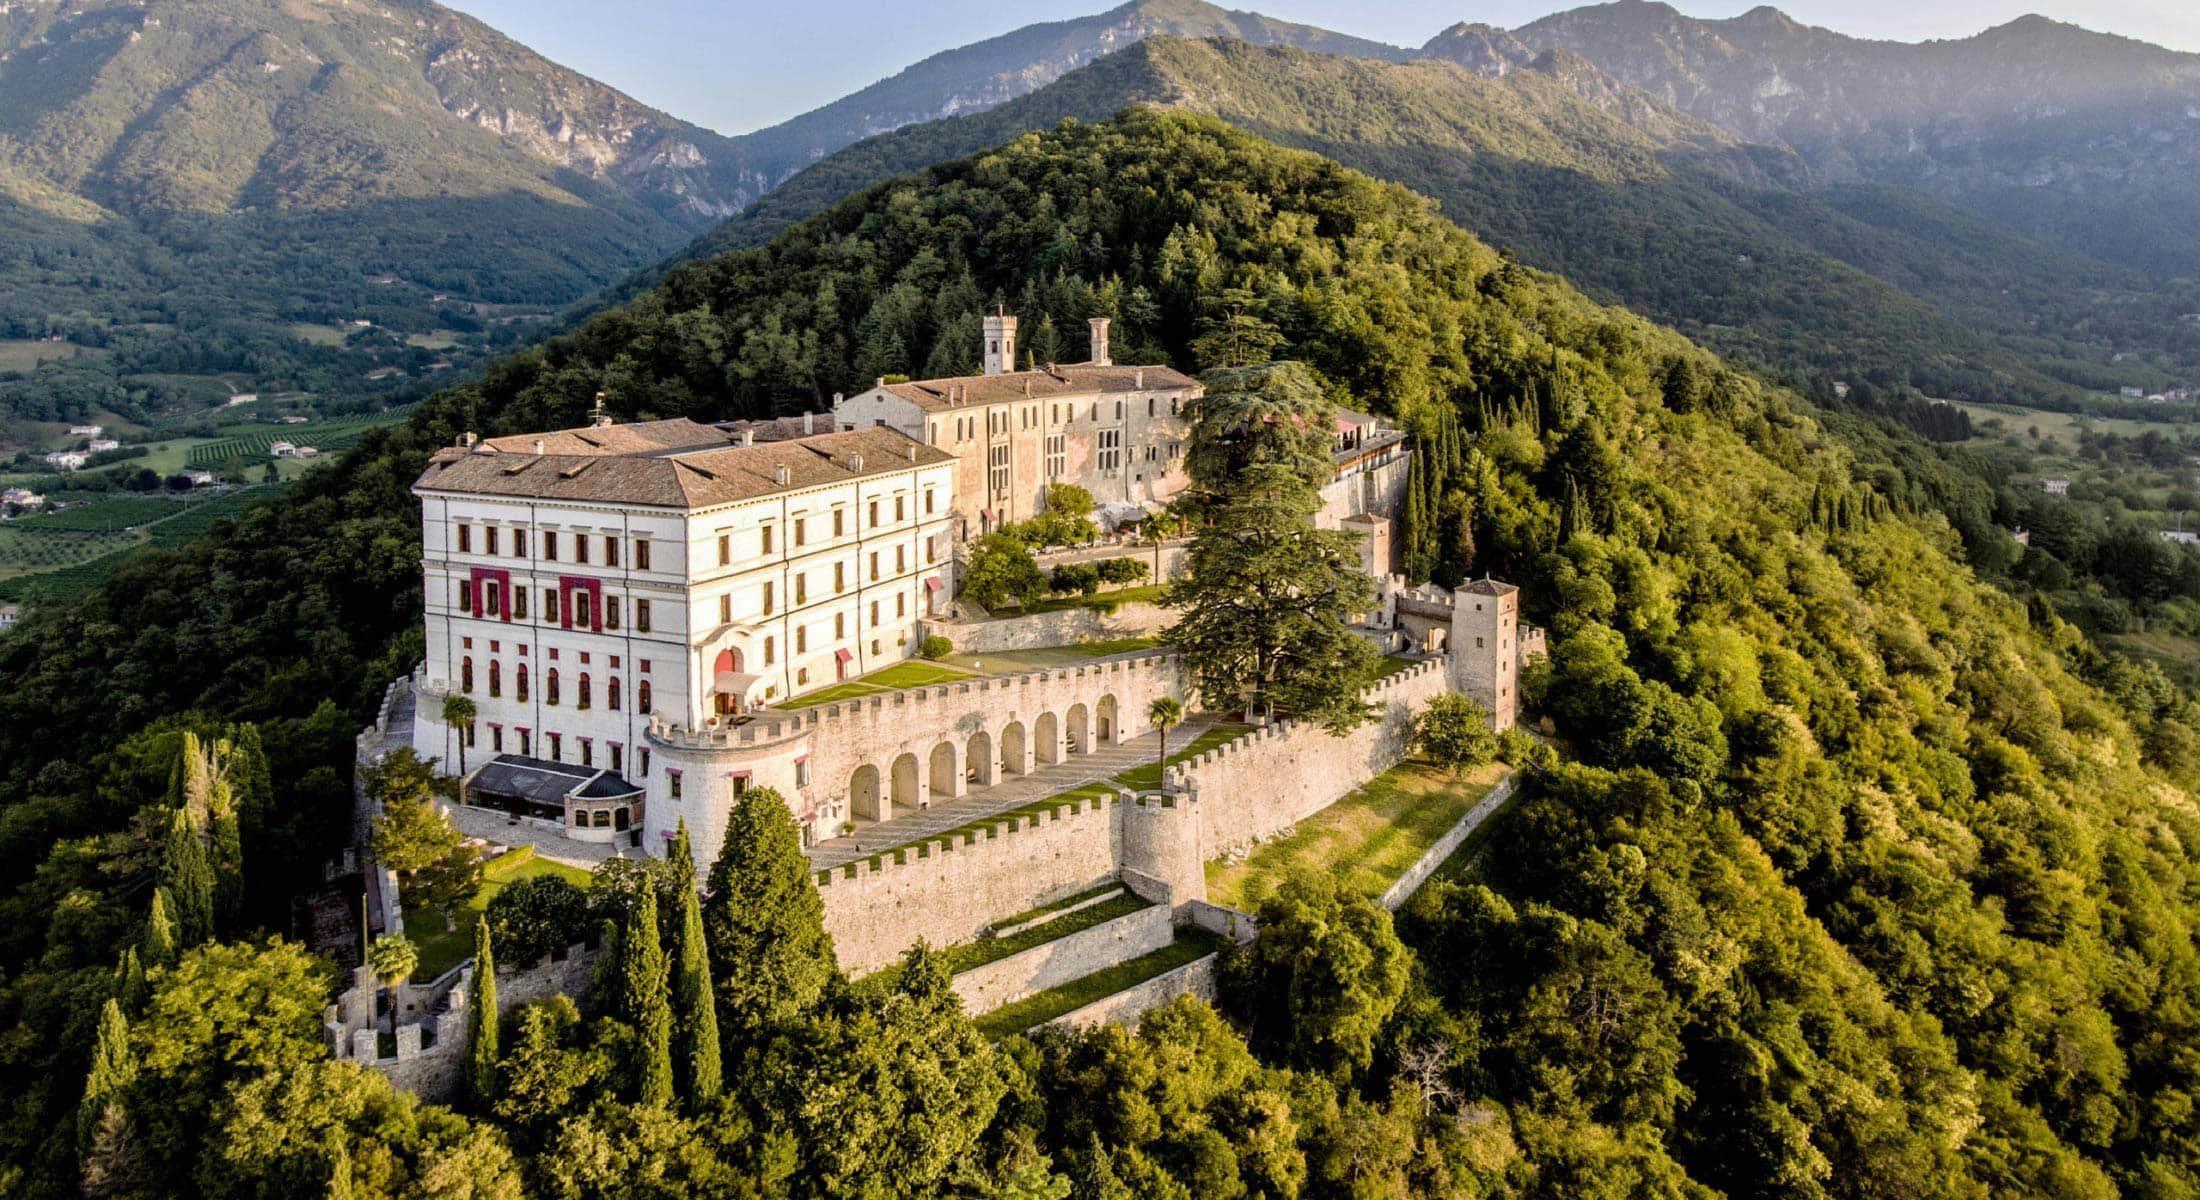 castelbrando-alba-estate-scaled-2200×12001-1-2200×1200